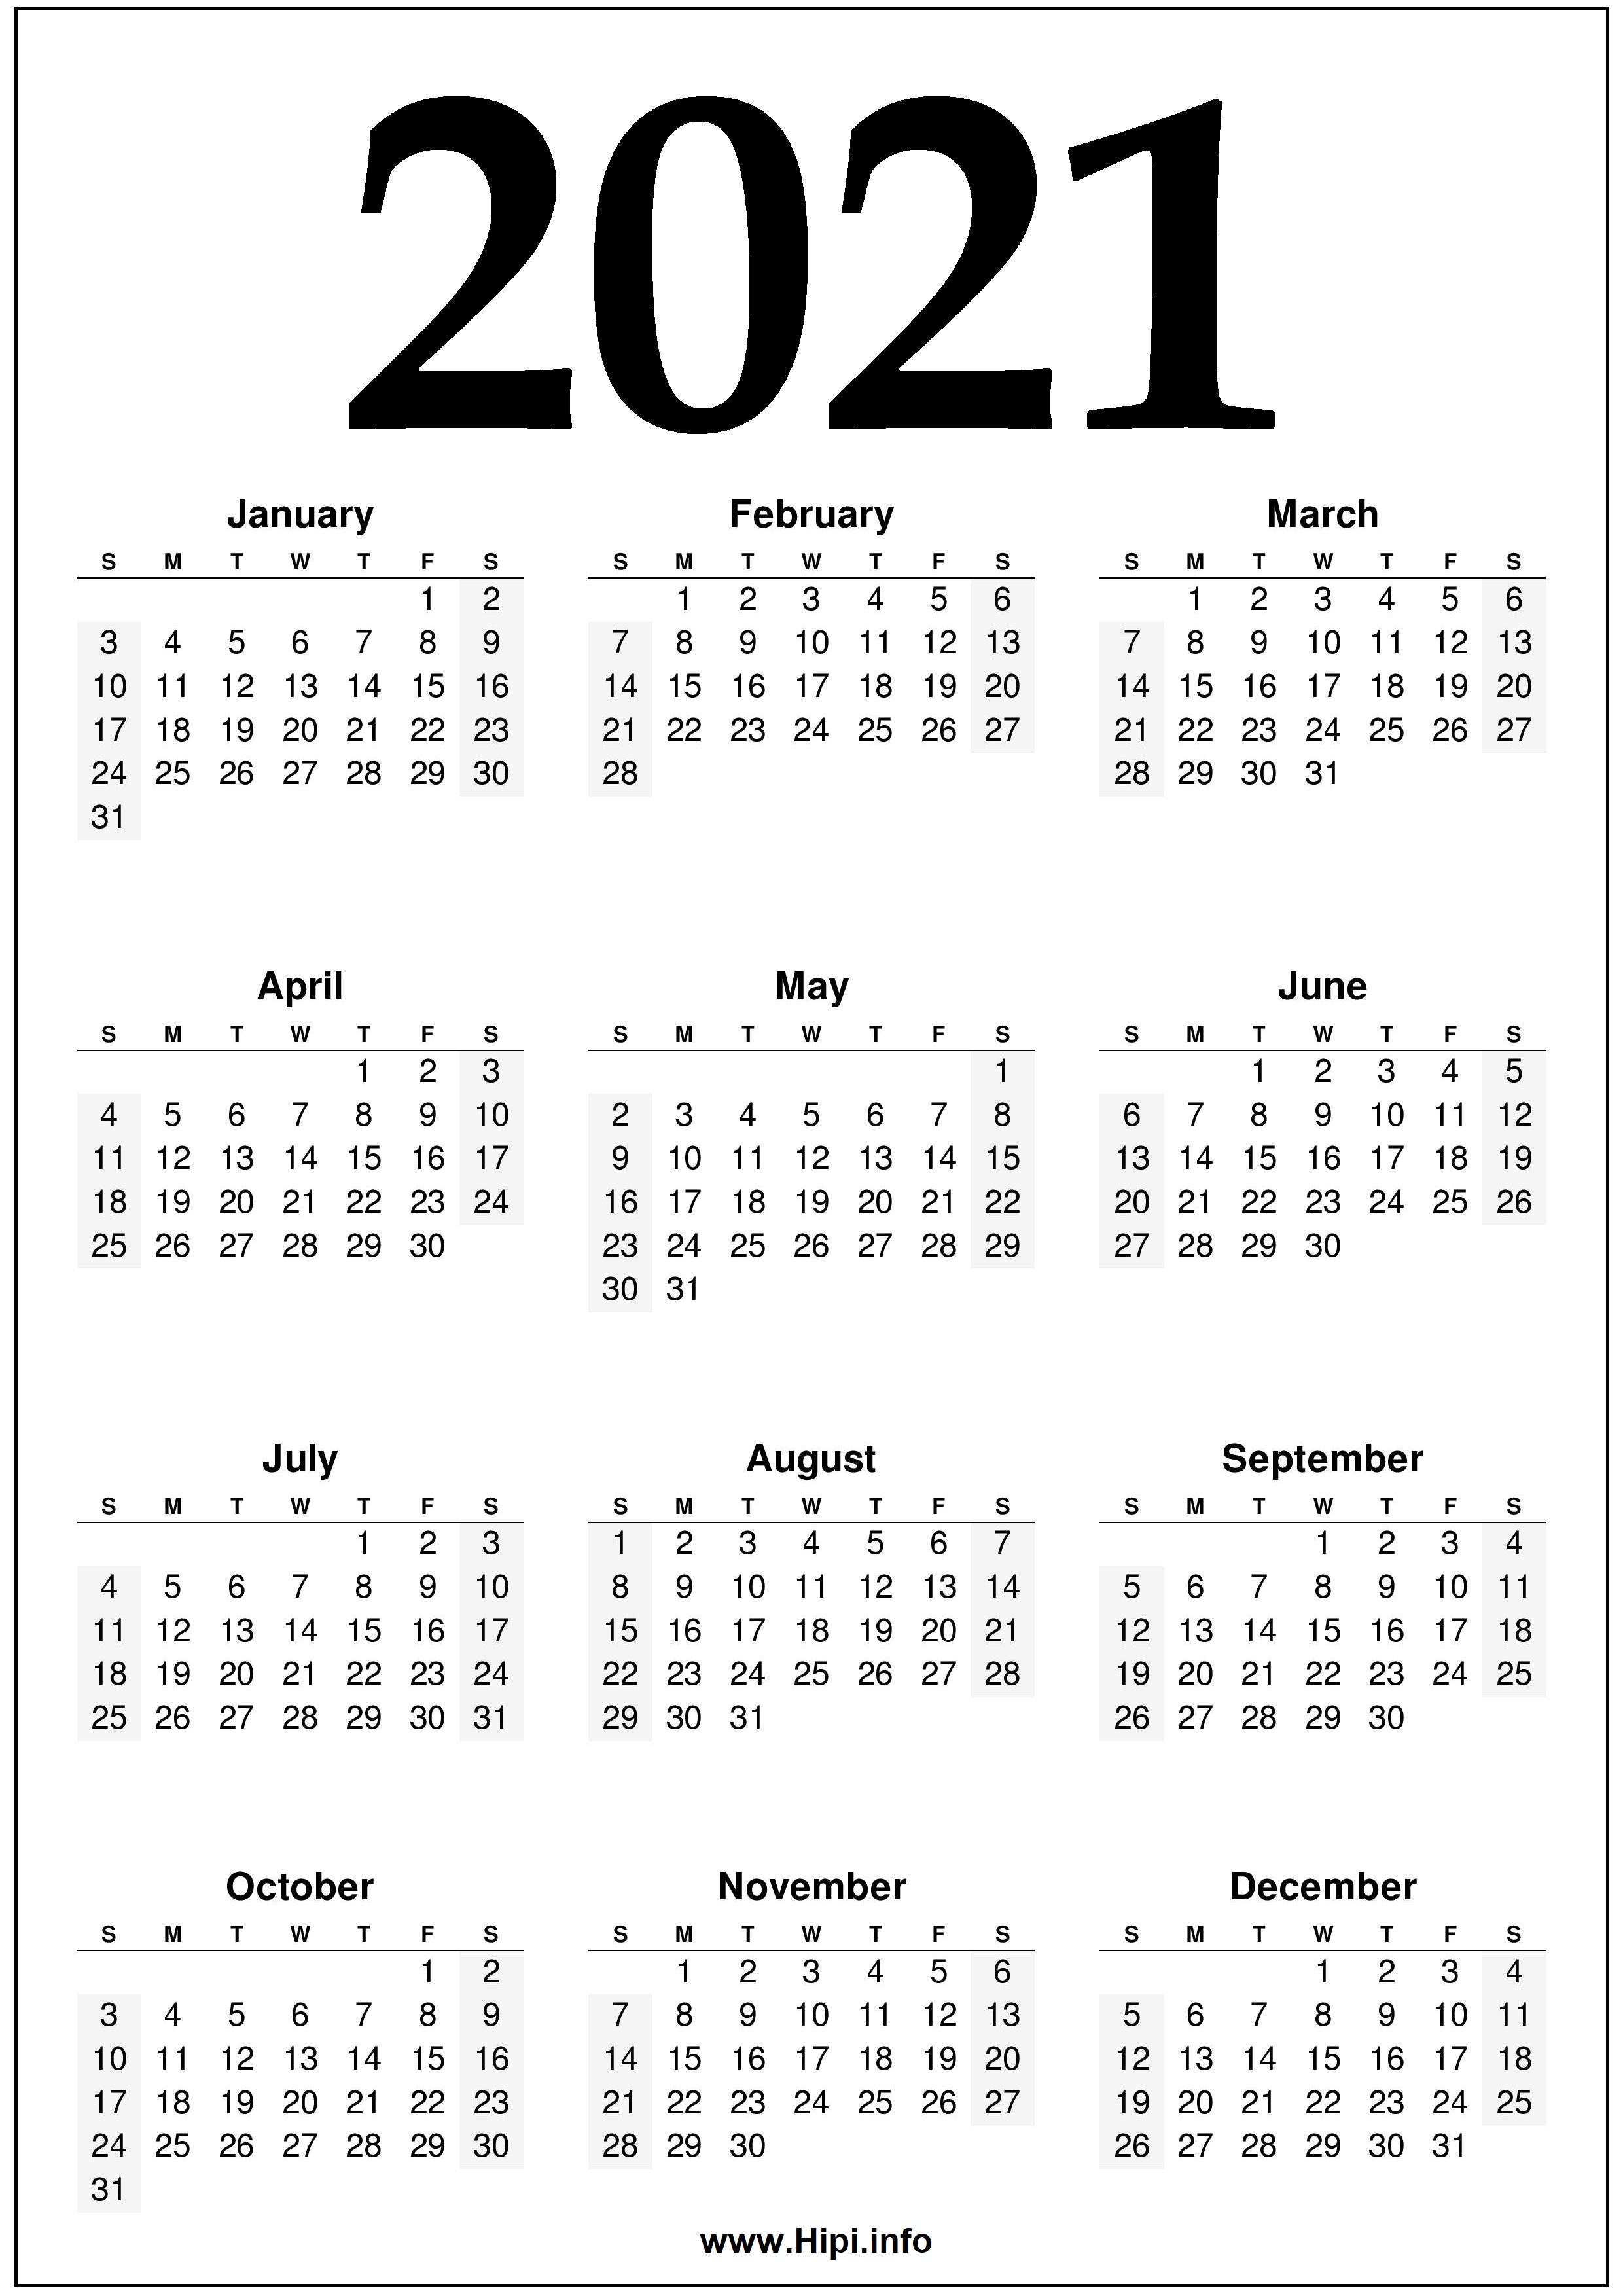 2021 Year 2021 Calendar Printable - Black And White - Hipi ...